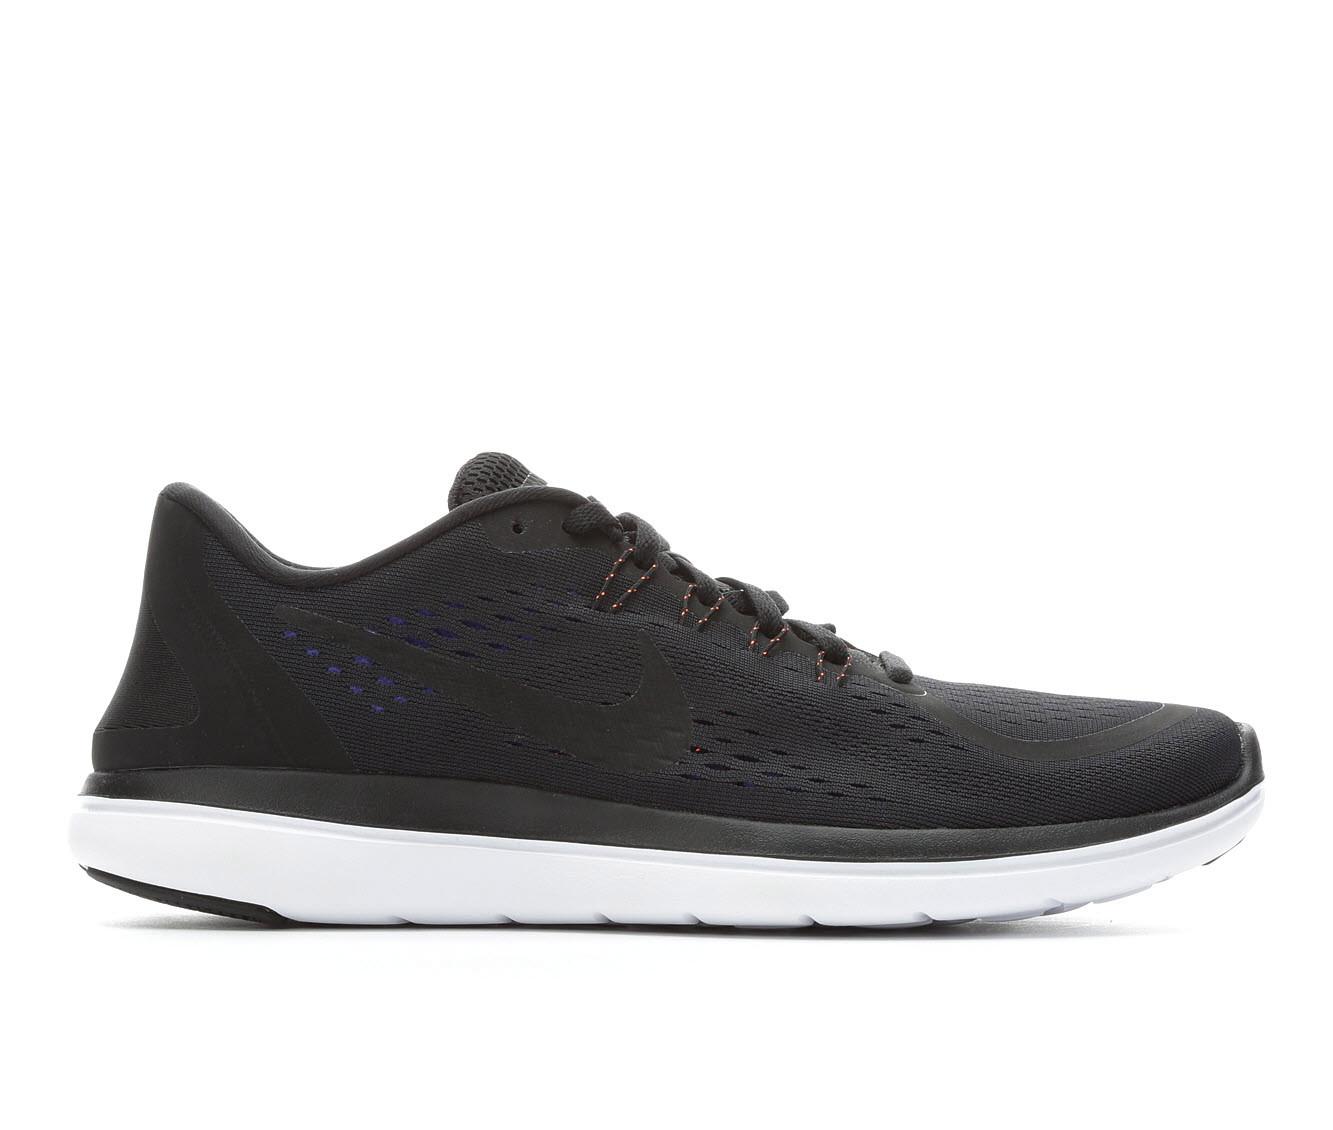 Men's Nike Flex 2017 Run Running Shoes (Black - Size 9) 1688858